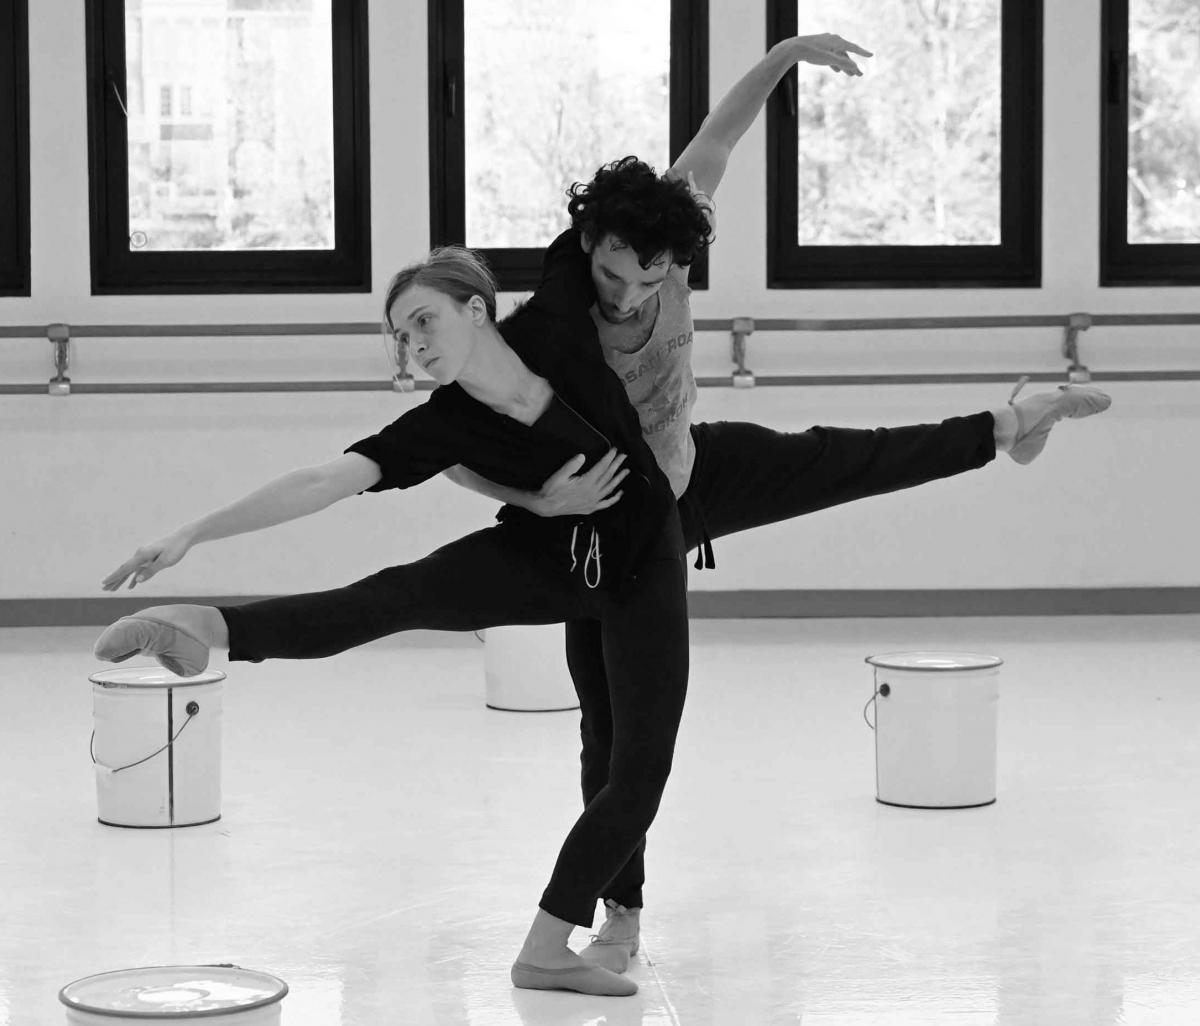 zDanse2 z nouveau ballet sur la musique de Sinfonia de Luciano Berio Irma Mickael.jpg